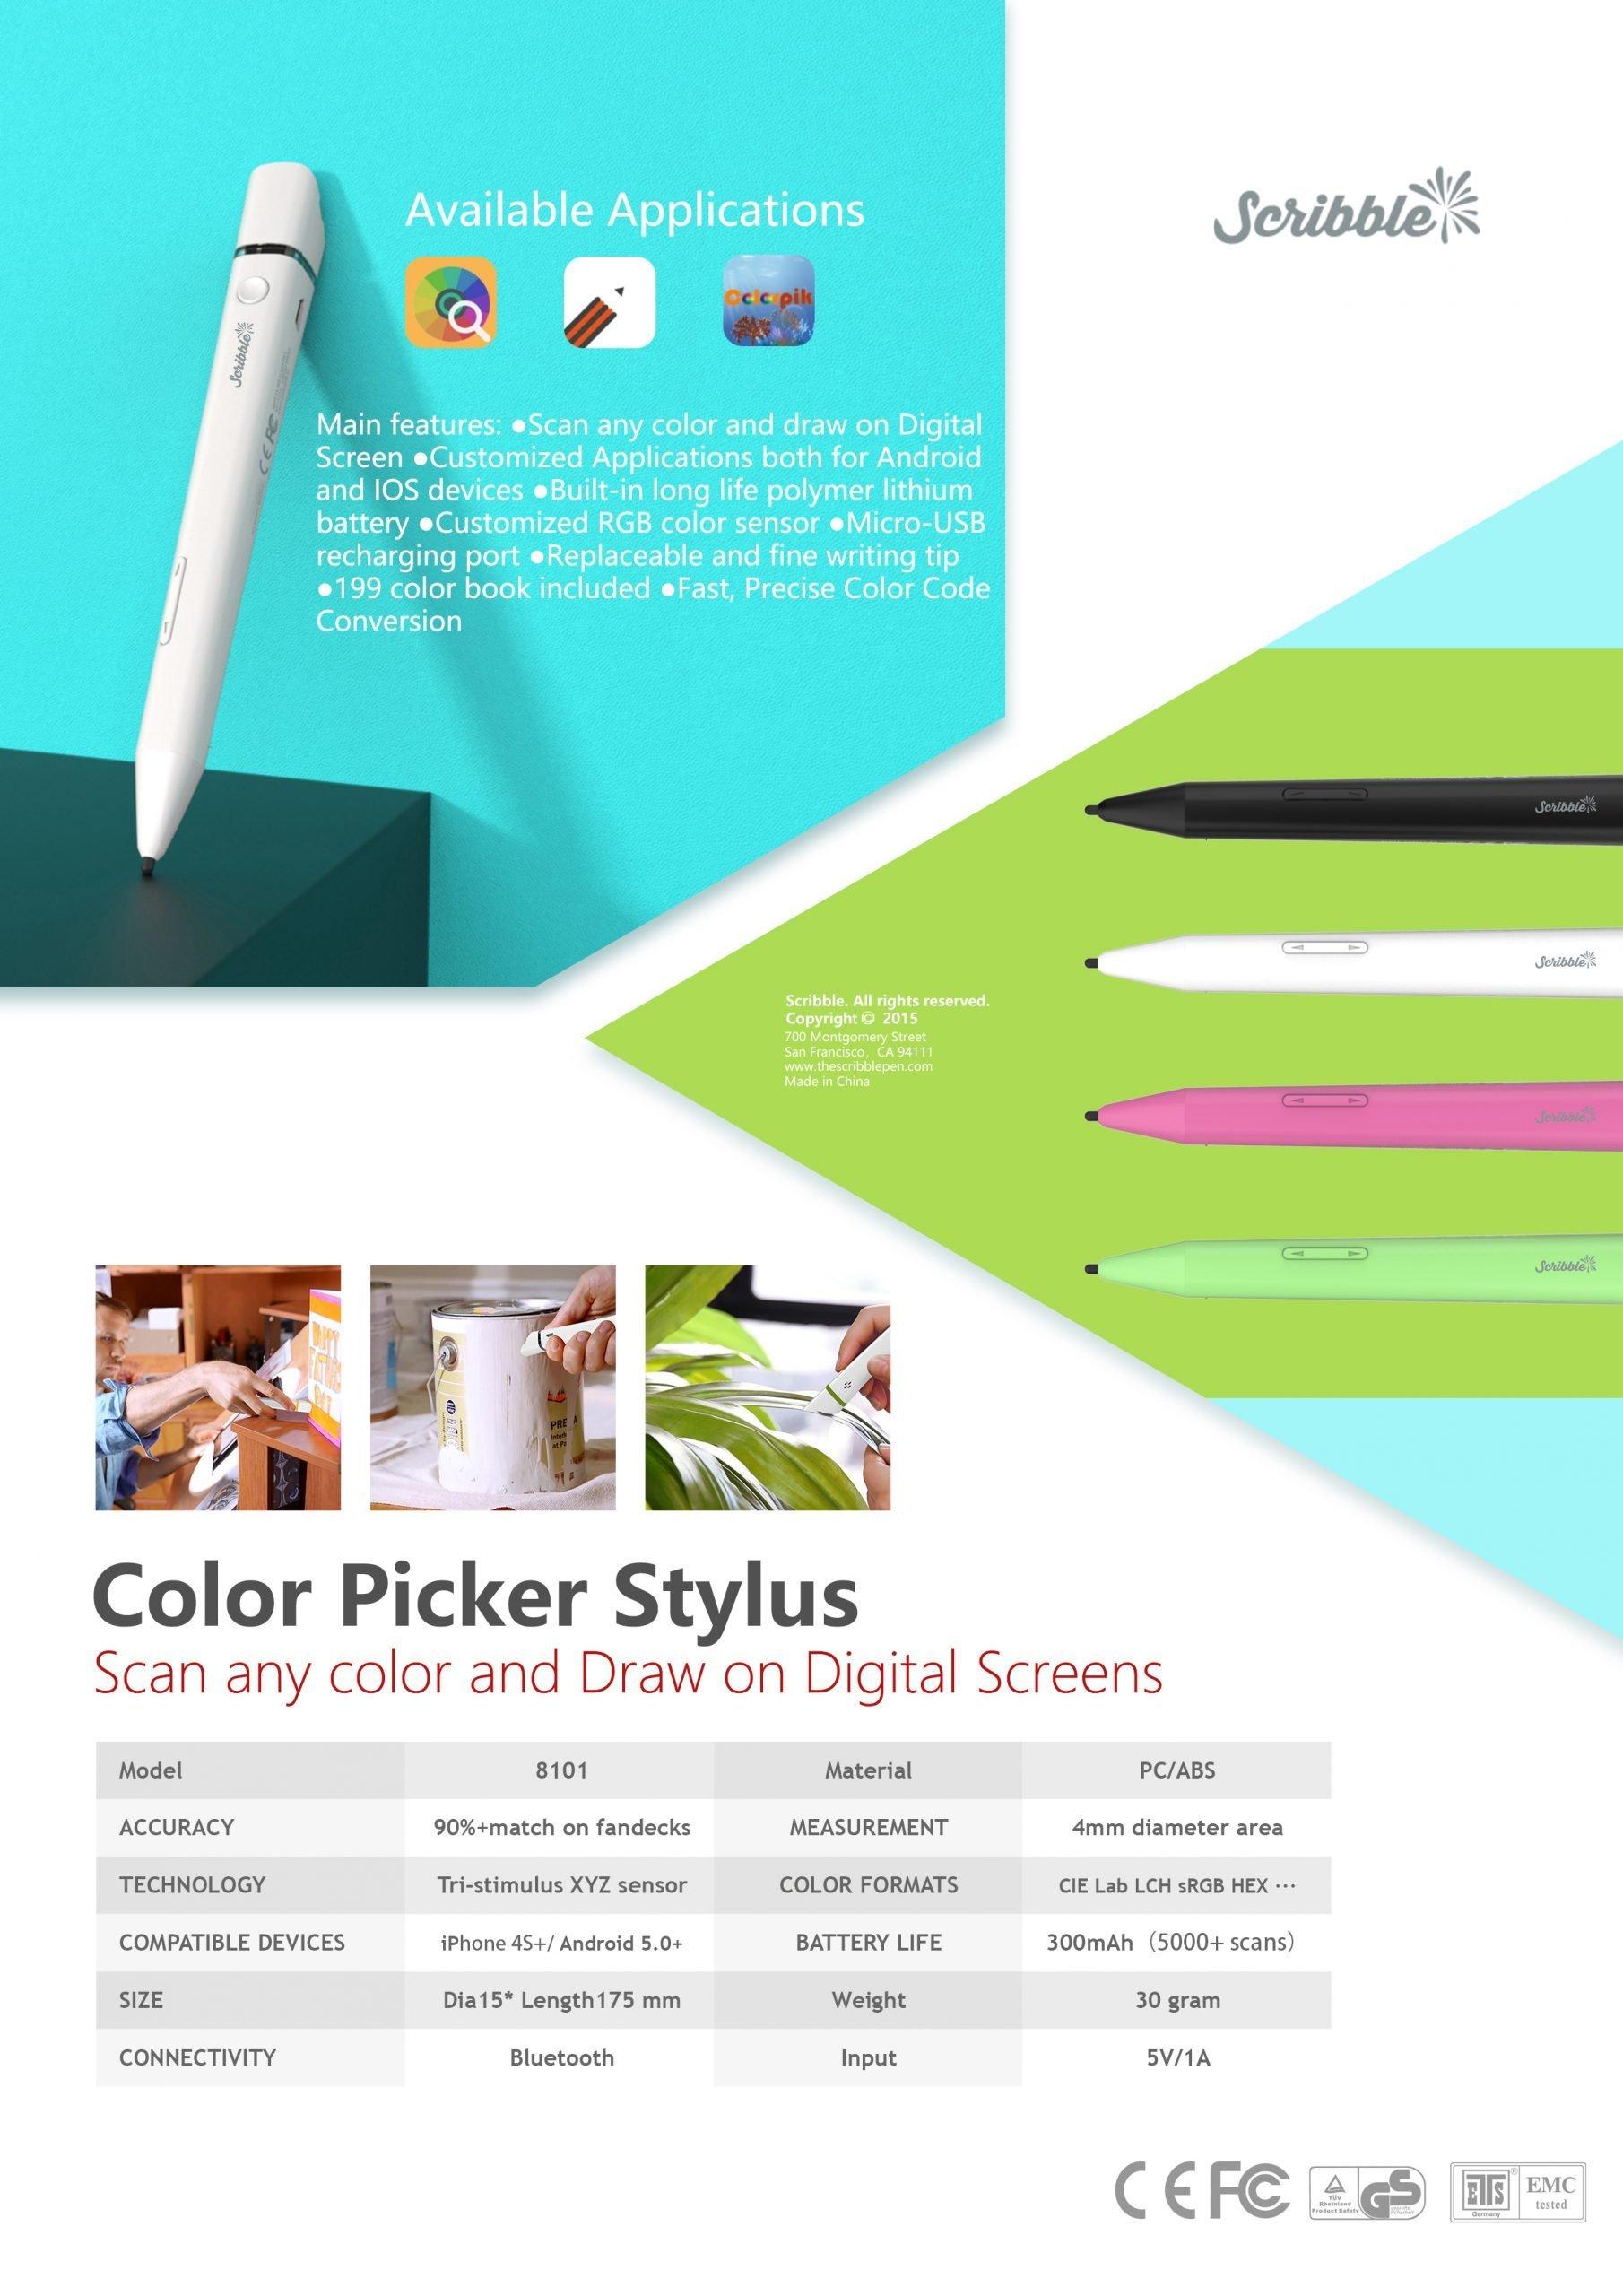 Color Picker Stylus